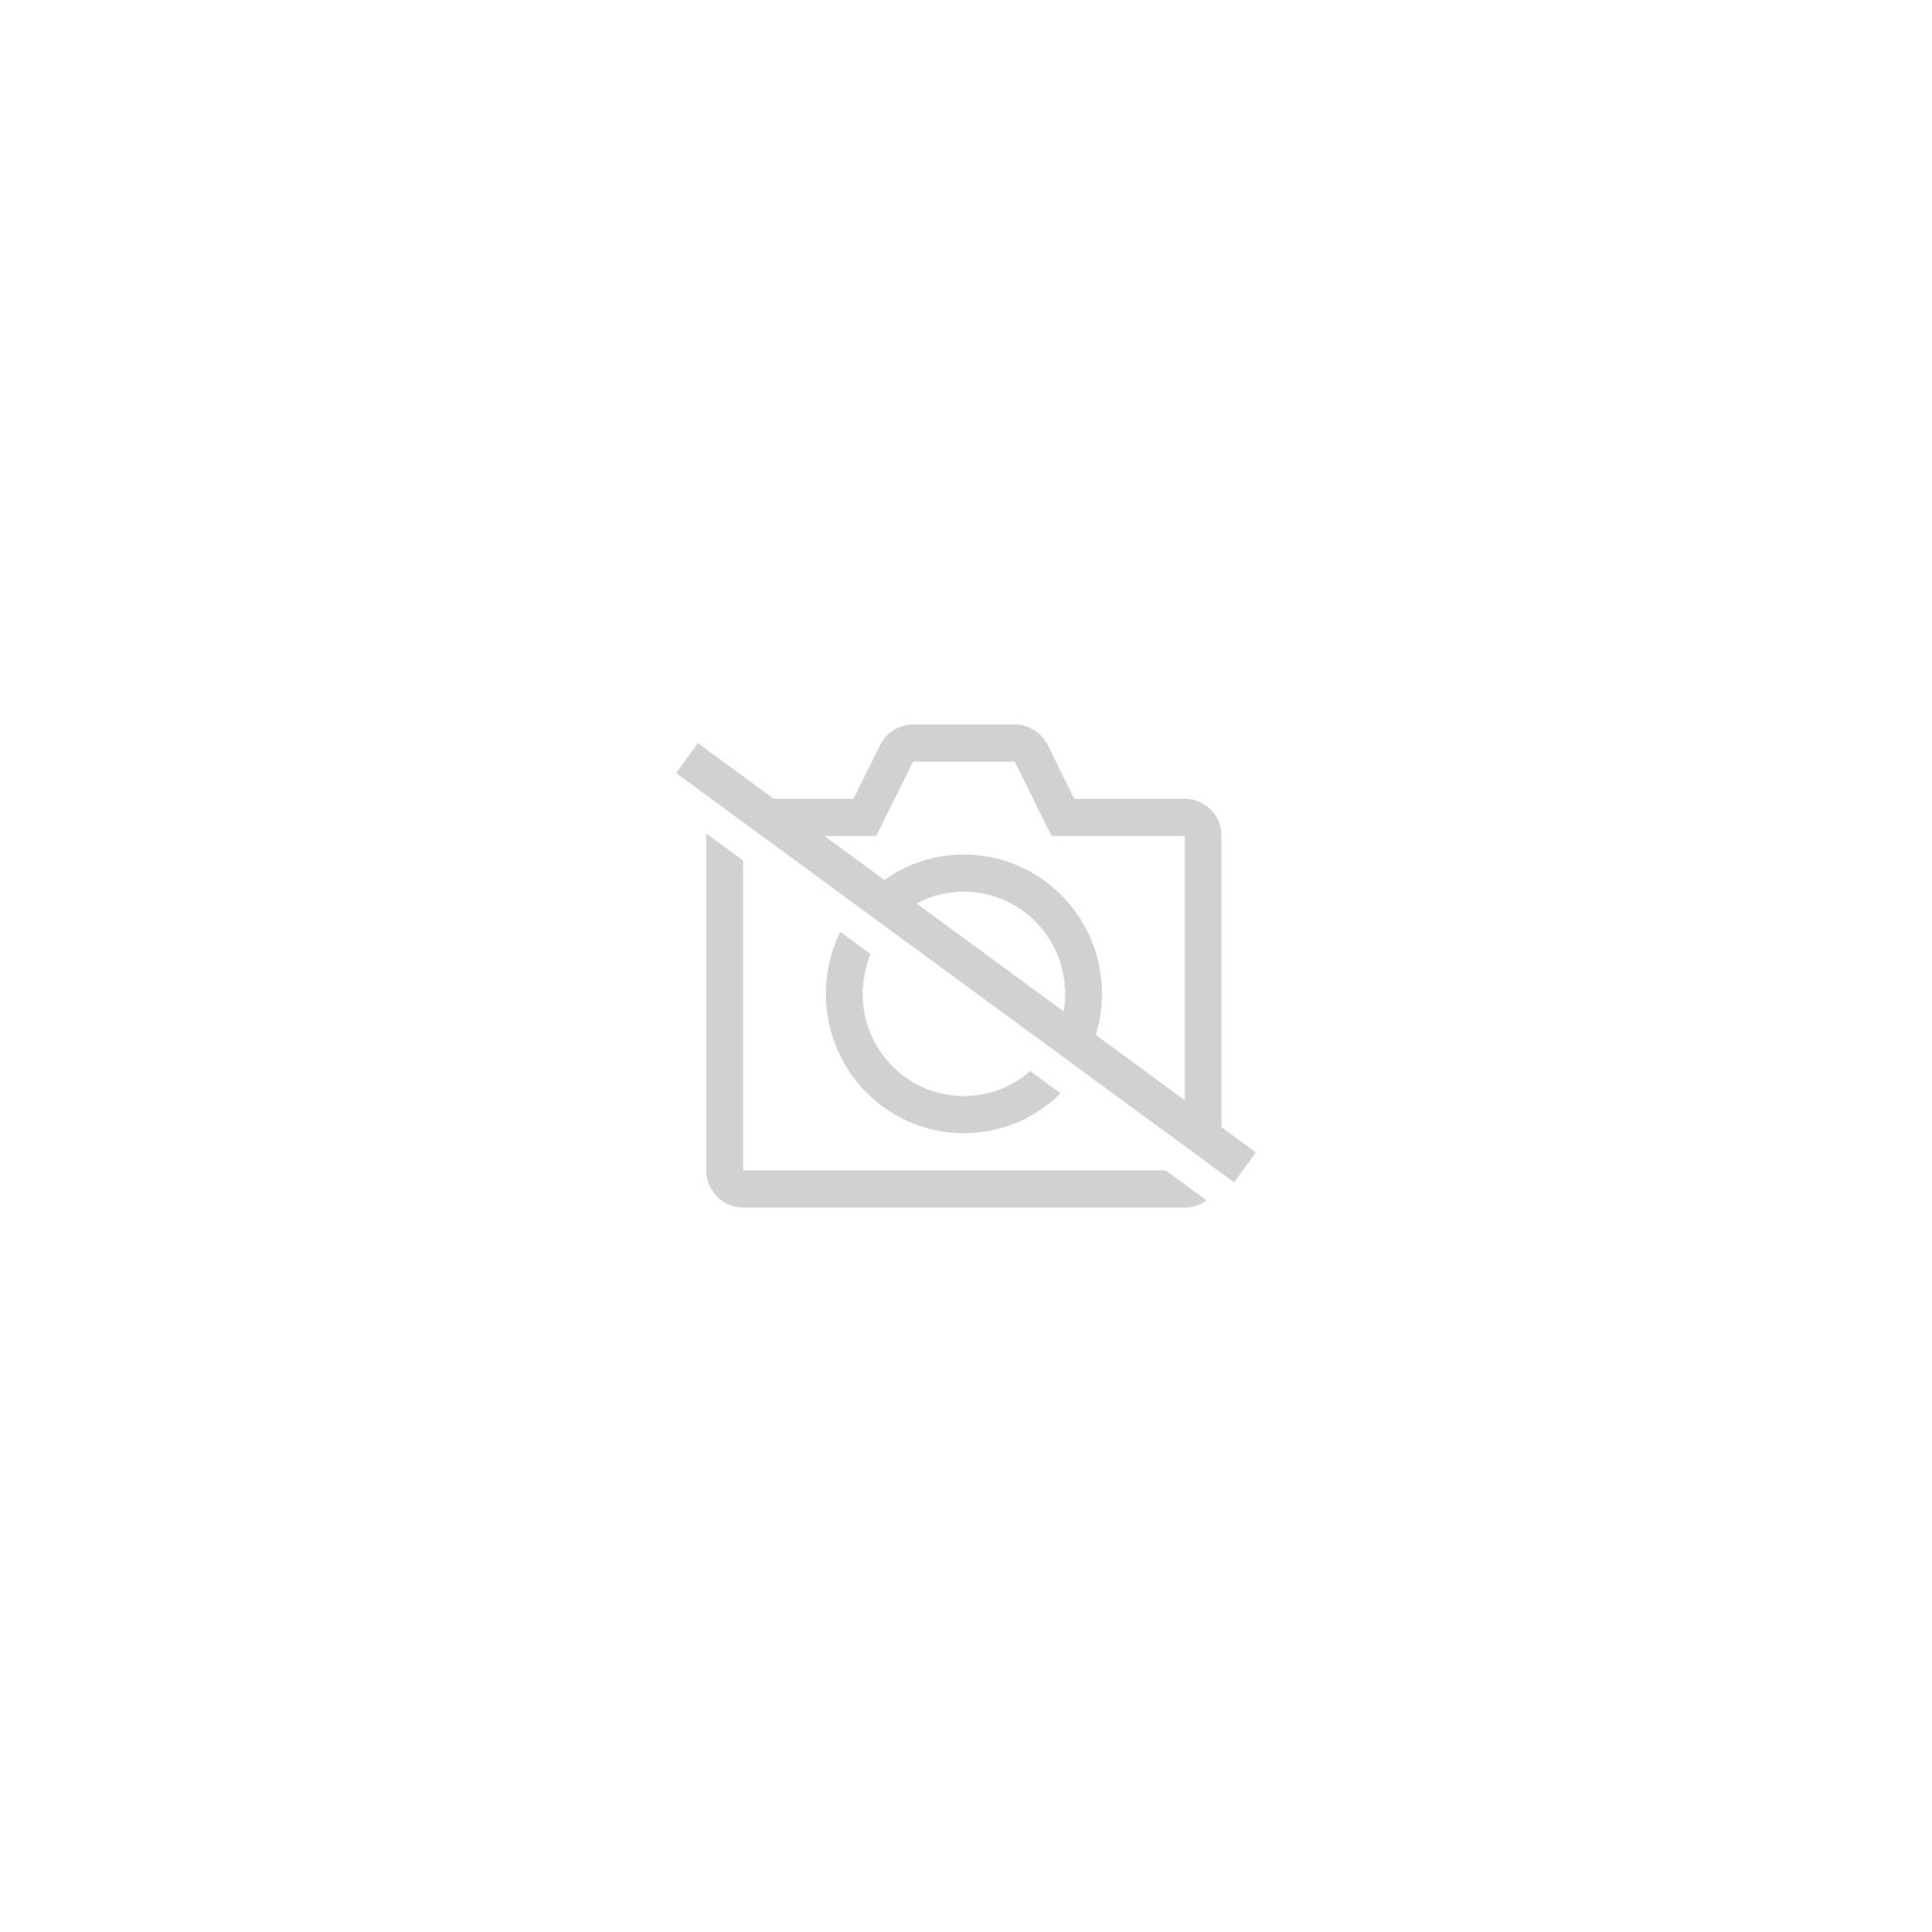 Vente Dunlop Dunlop Fuzz Face Jimi Hendrix - Jhf1